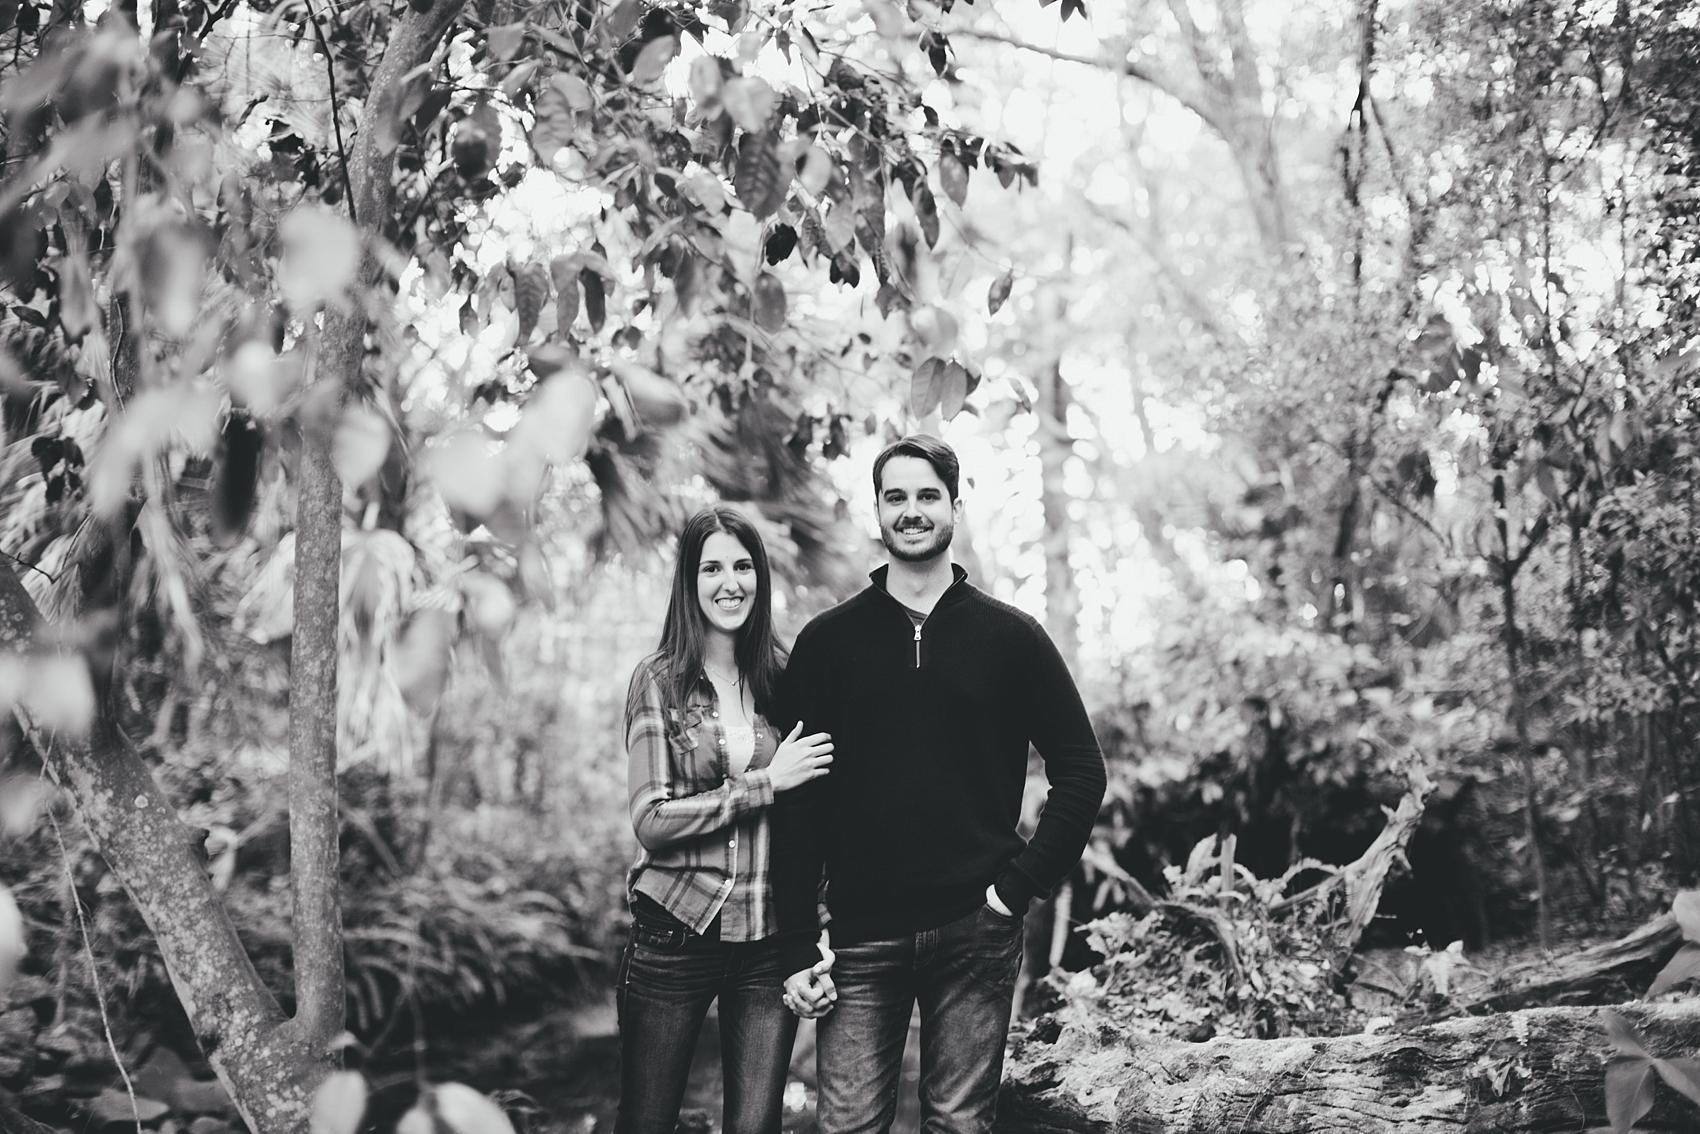 Jake & Katie Photography Seminole Heights Engagement Photos David & Cailyn-002.jpg